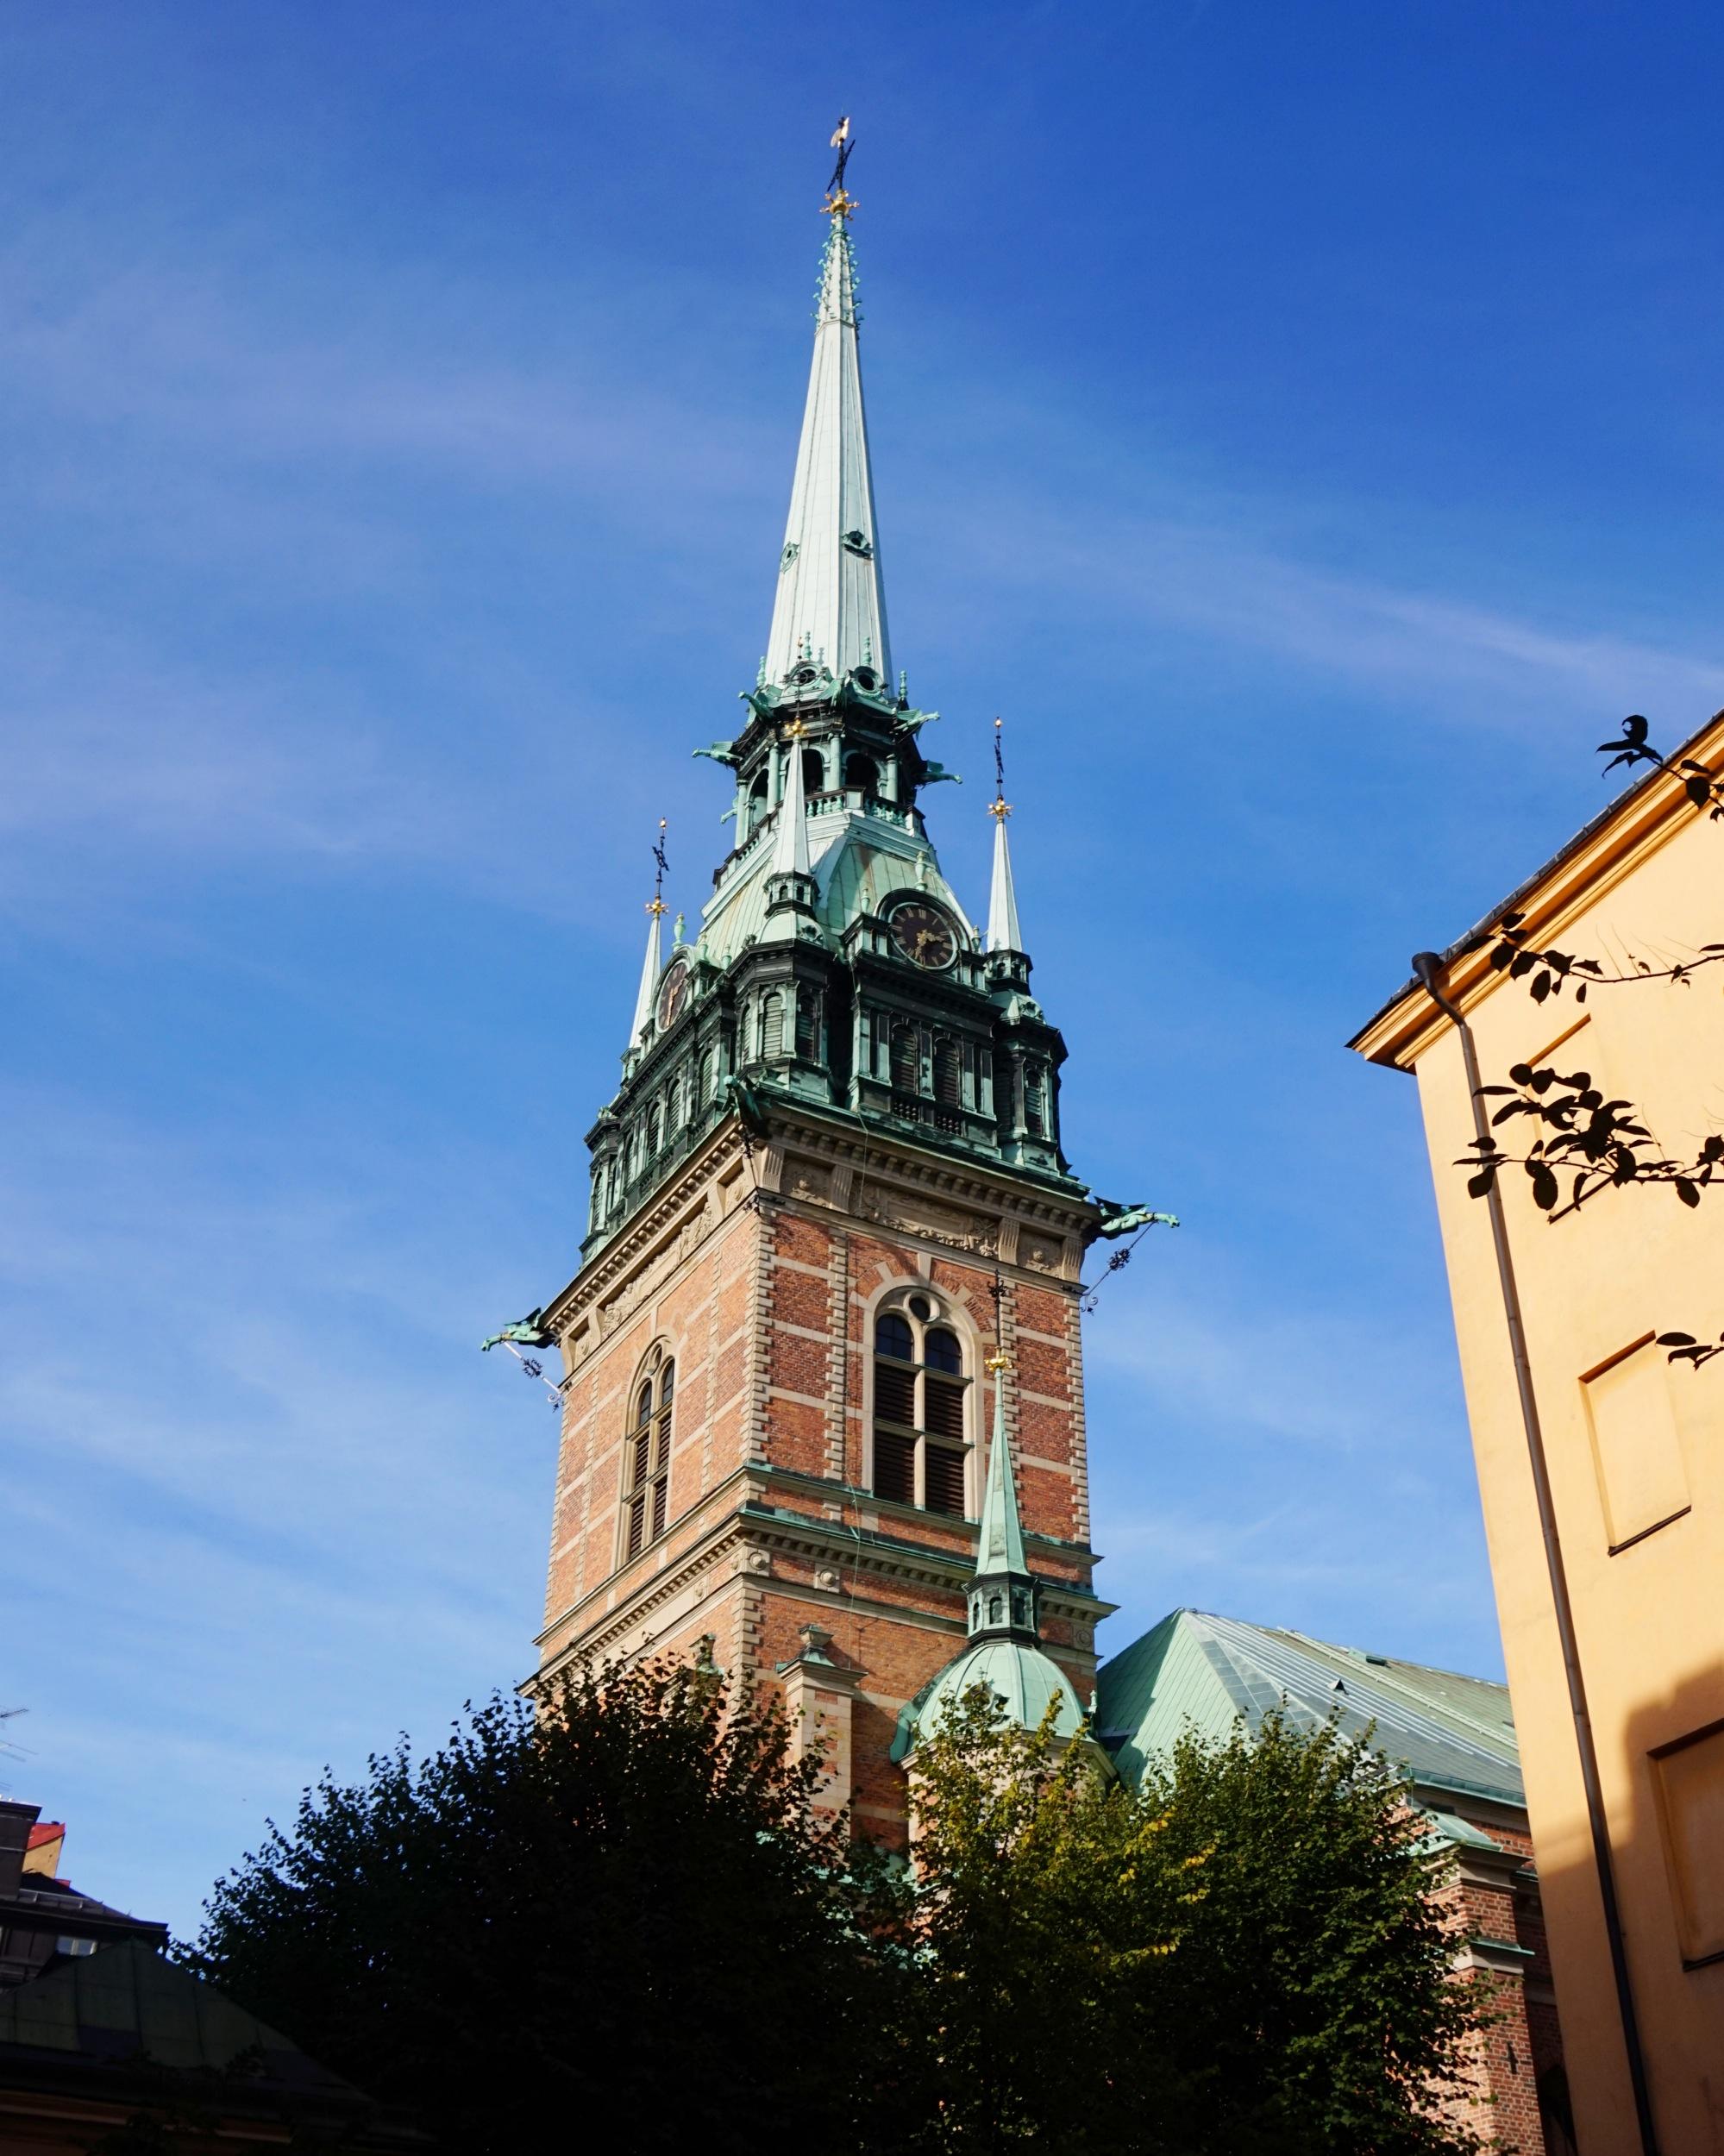 3-jours-a-stockholm-42